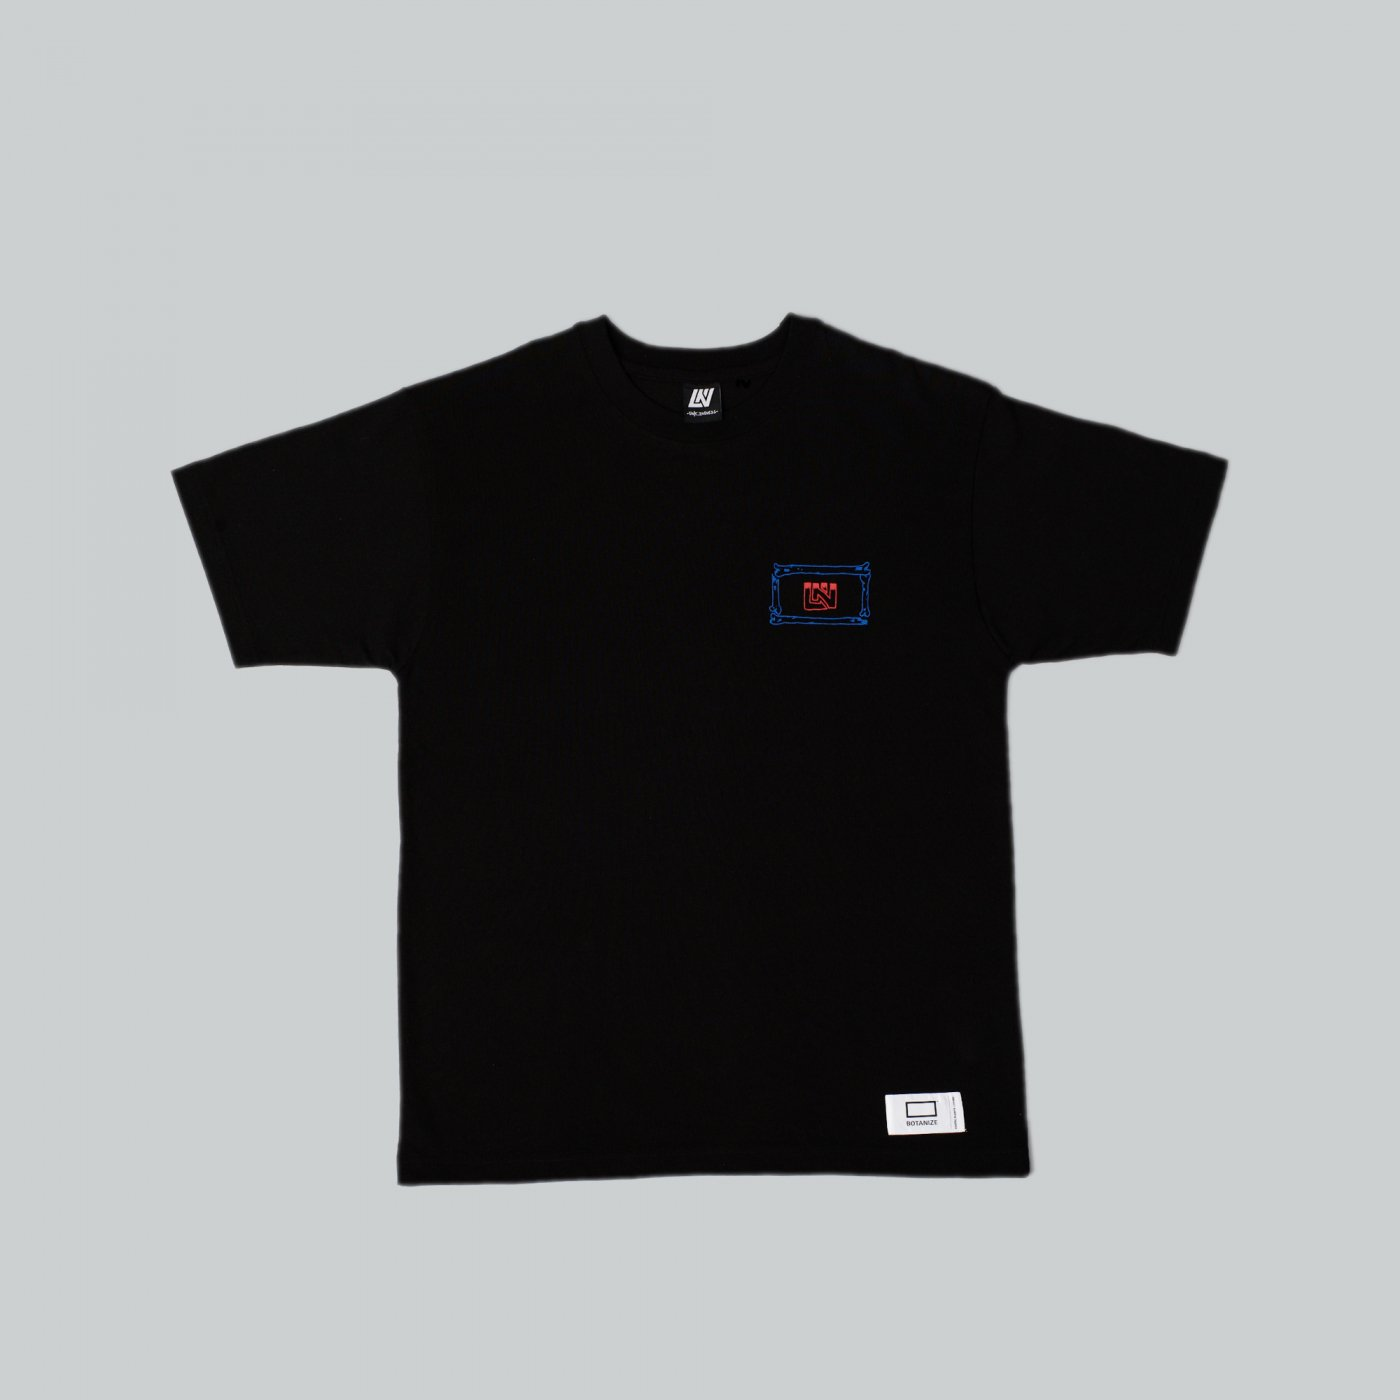 UNKINDNESS × AVGS × BOTANIZE  t-shirt  BLACK